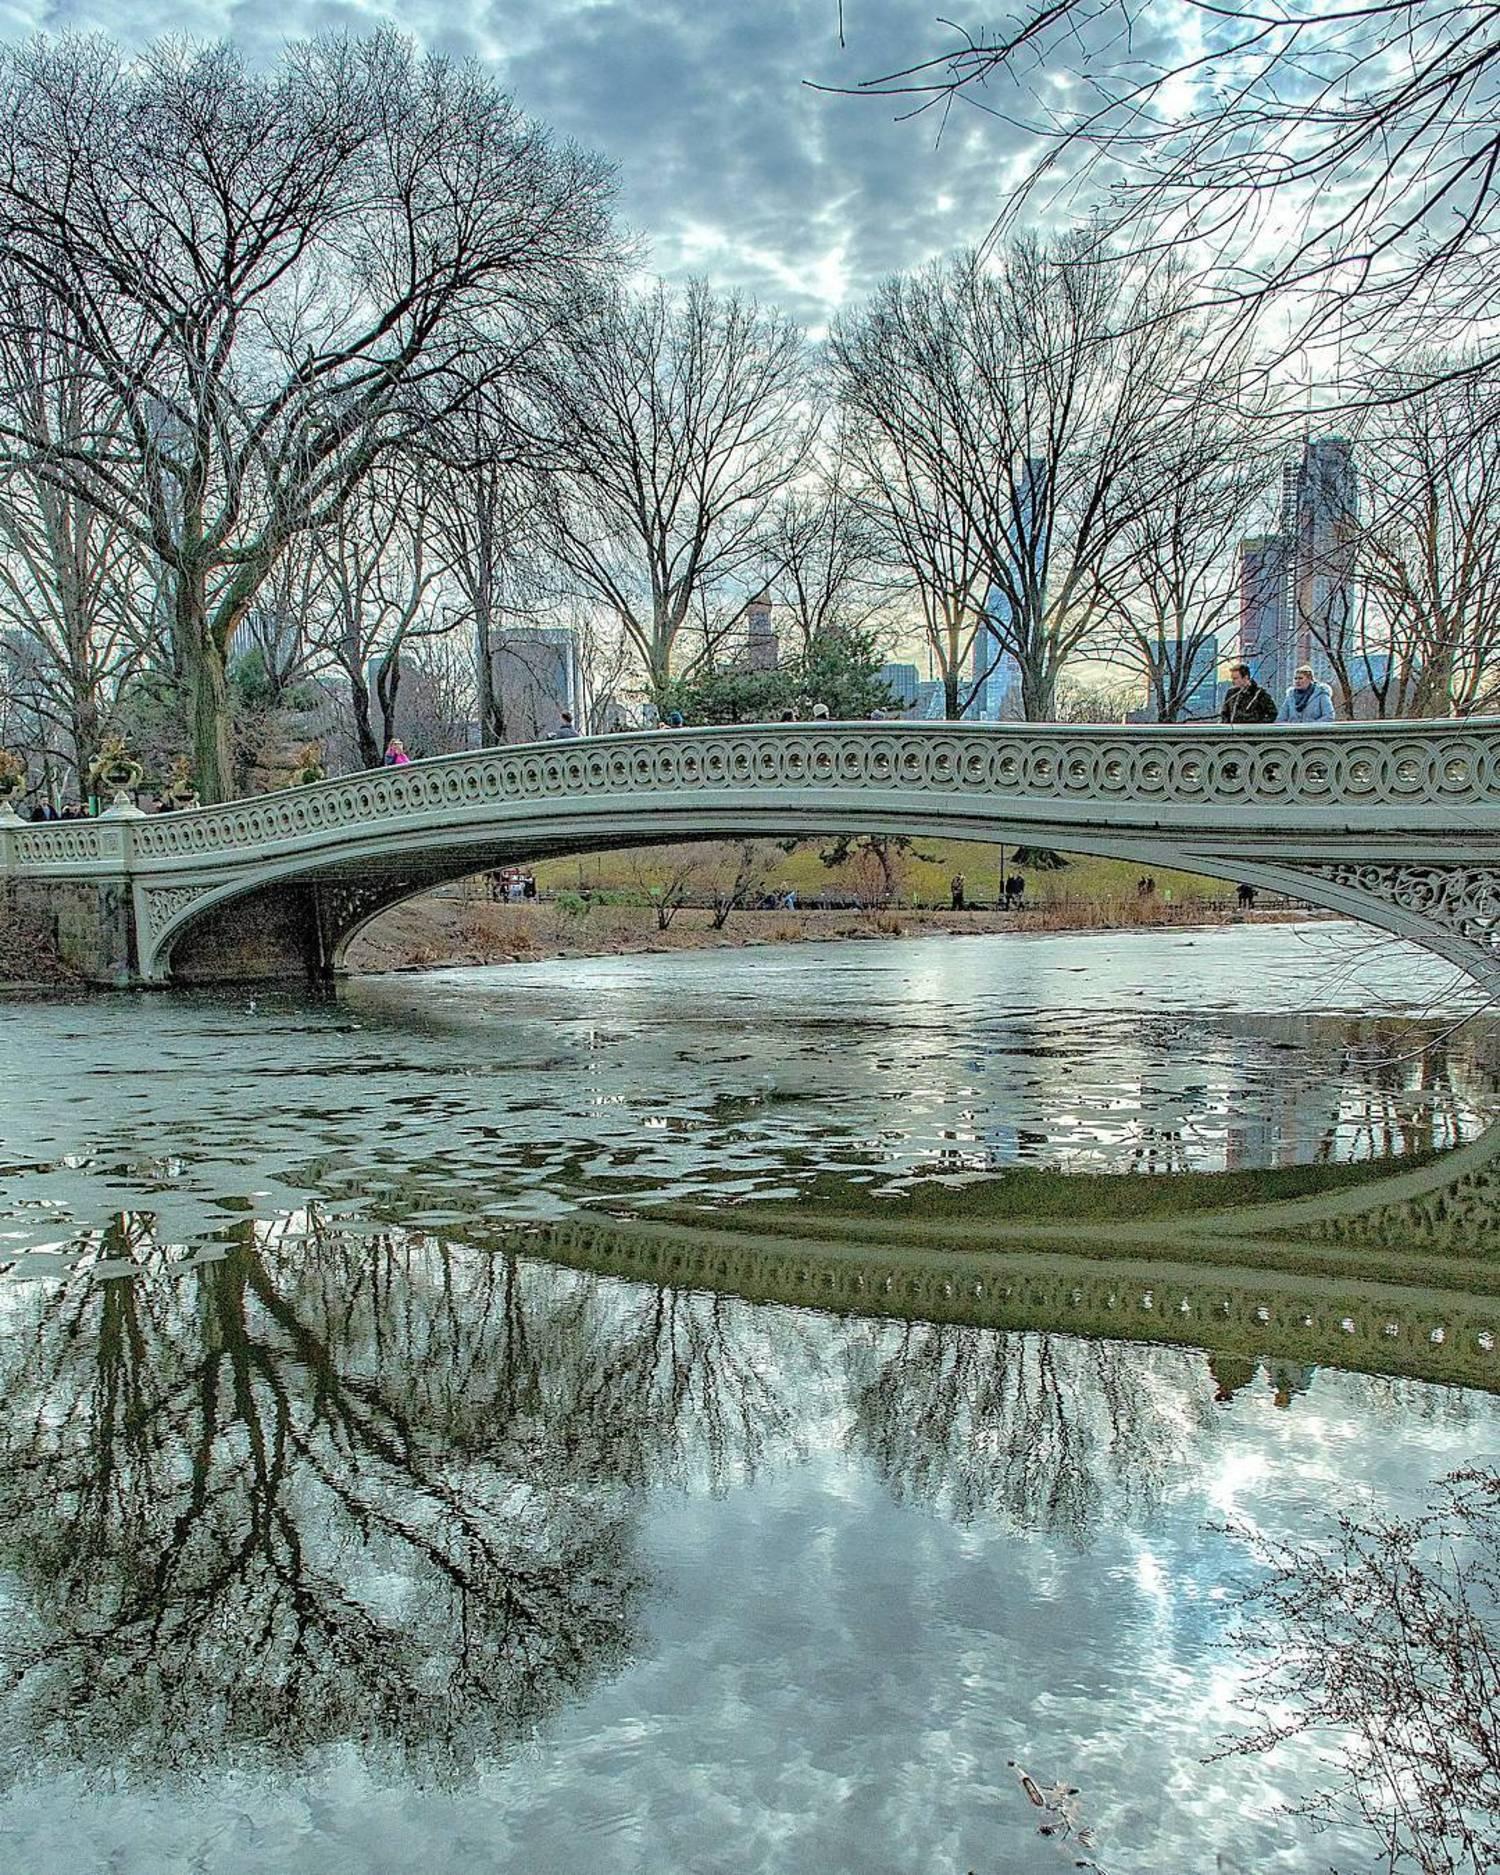 Bow Bridge, Central Park, New York, New York